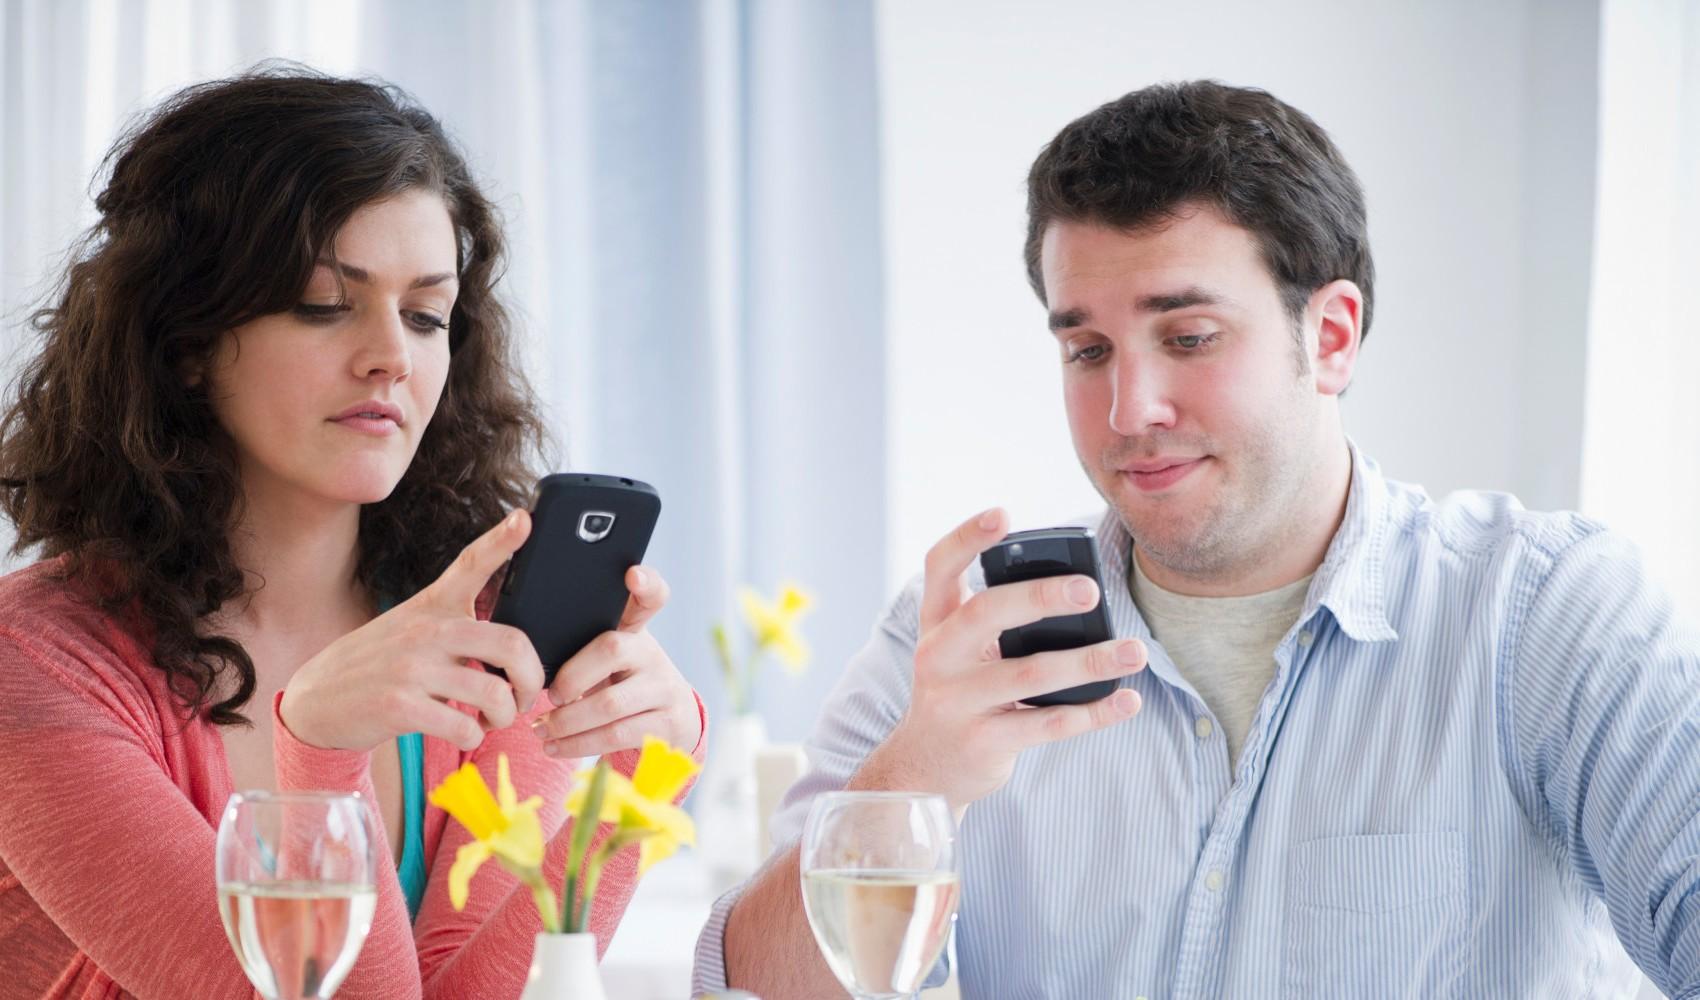 akibat smartphone